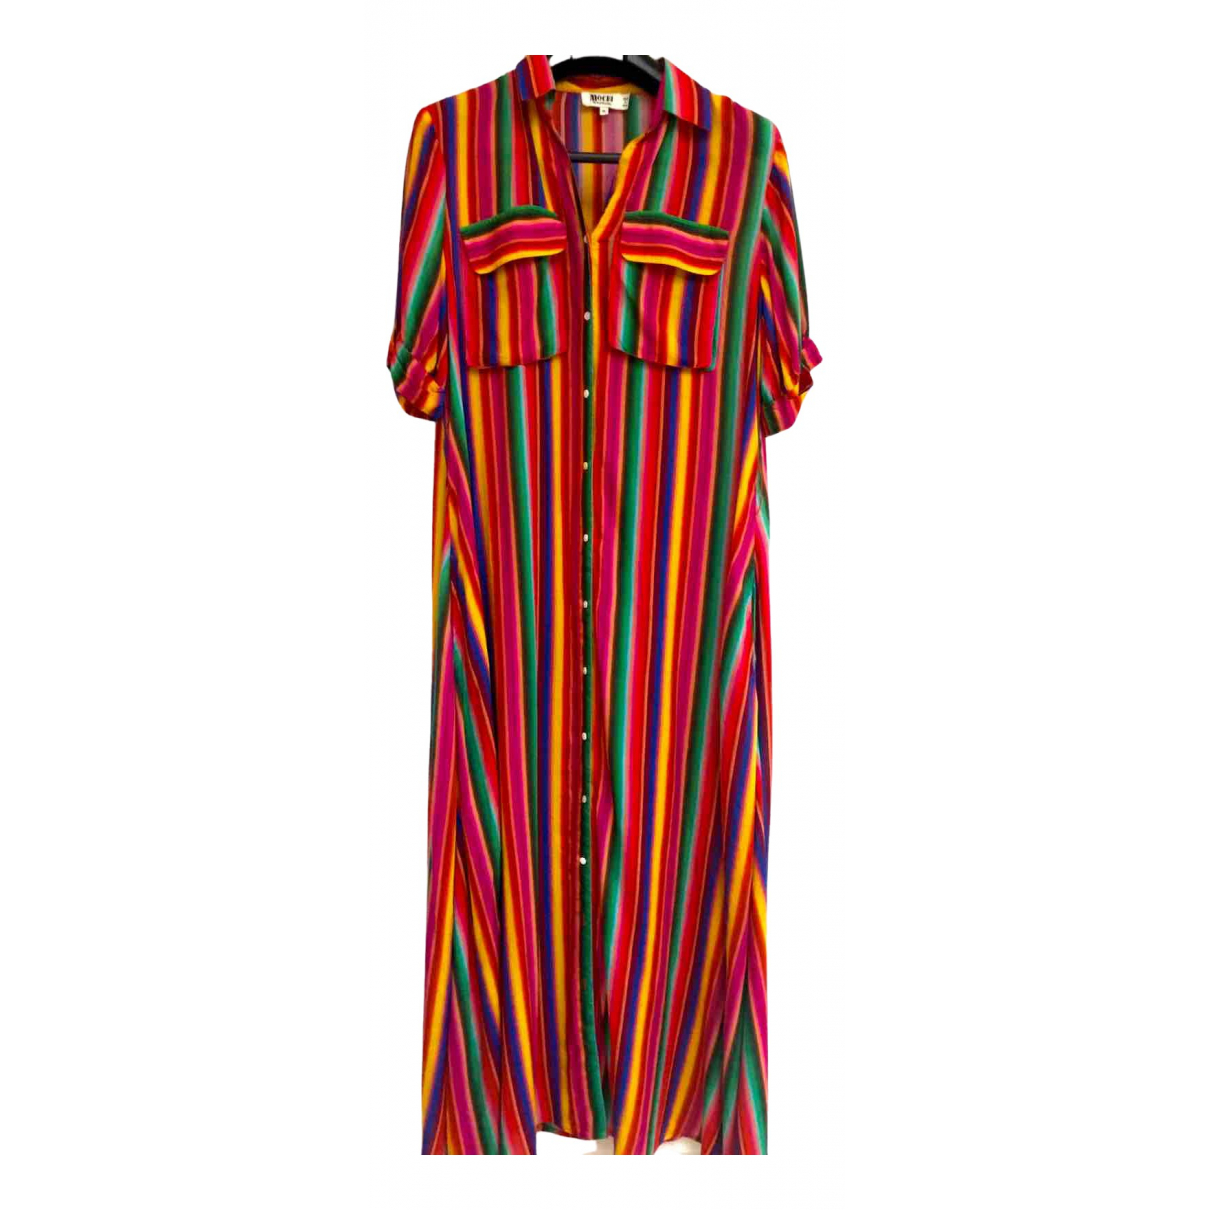 Mochi - Robe   pour femme - multicolore